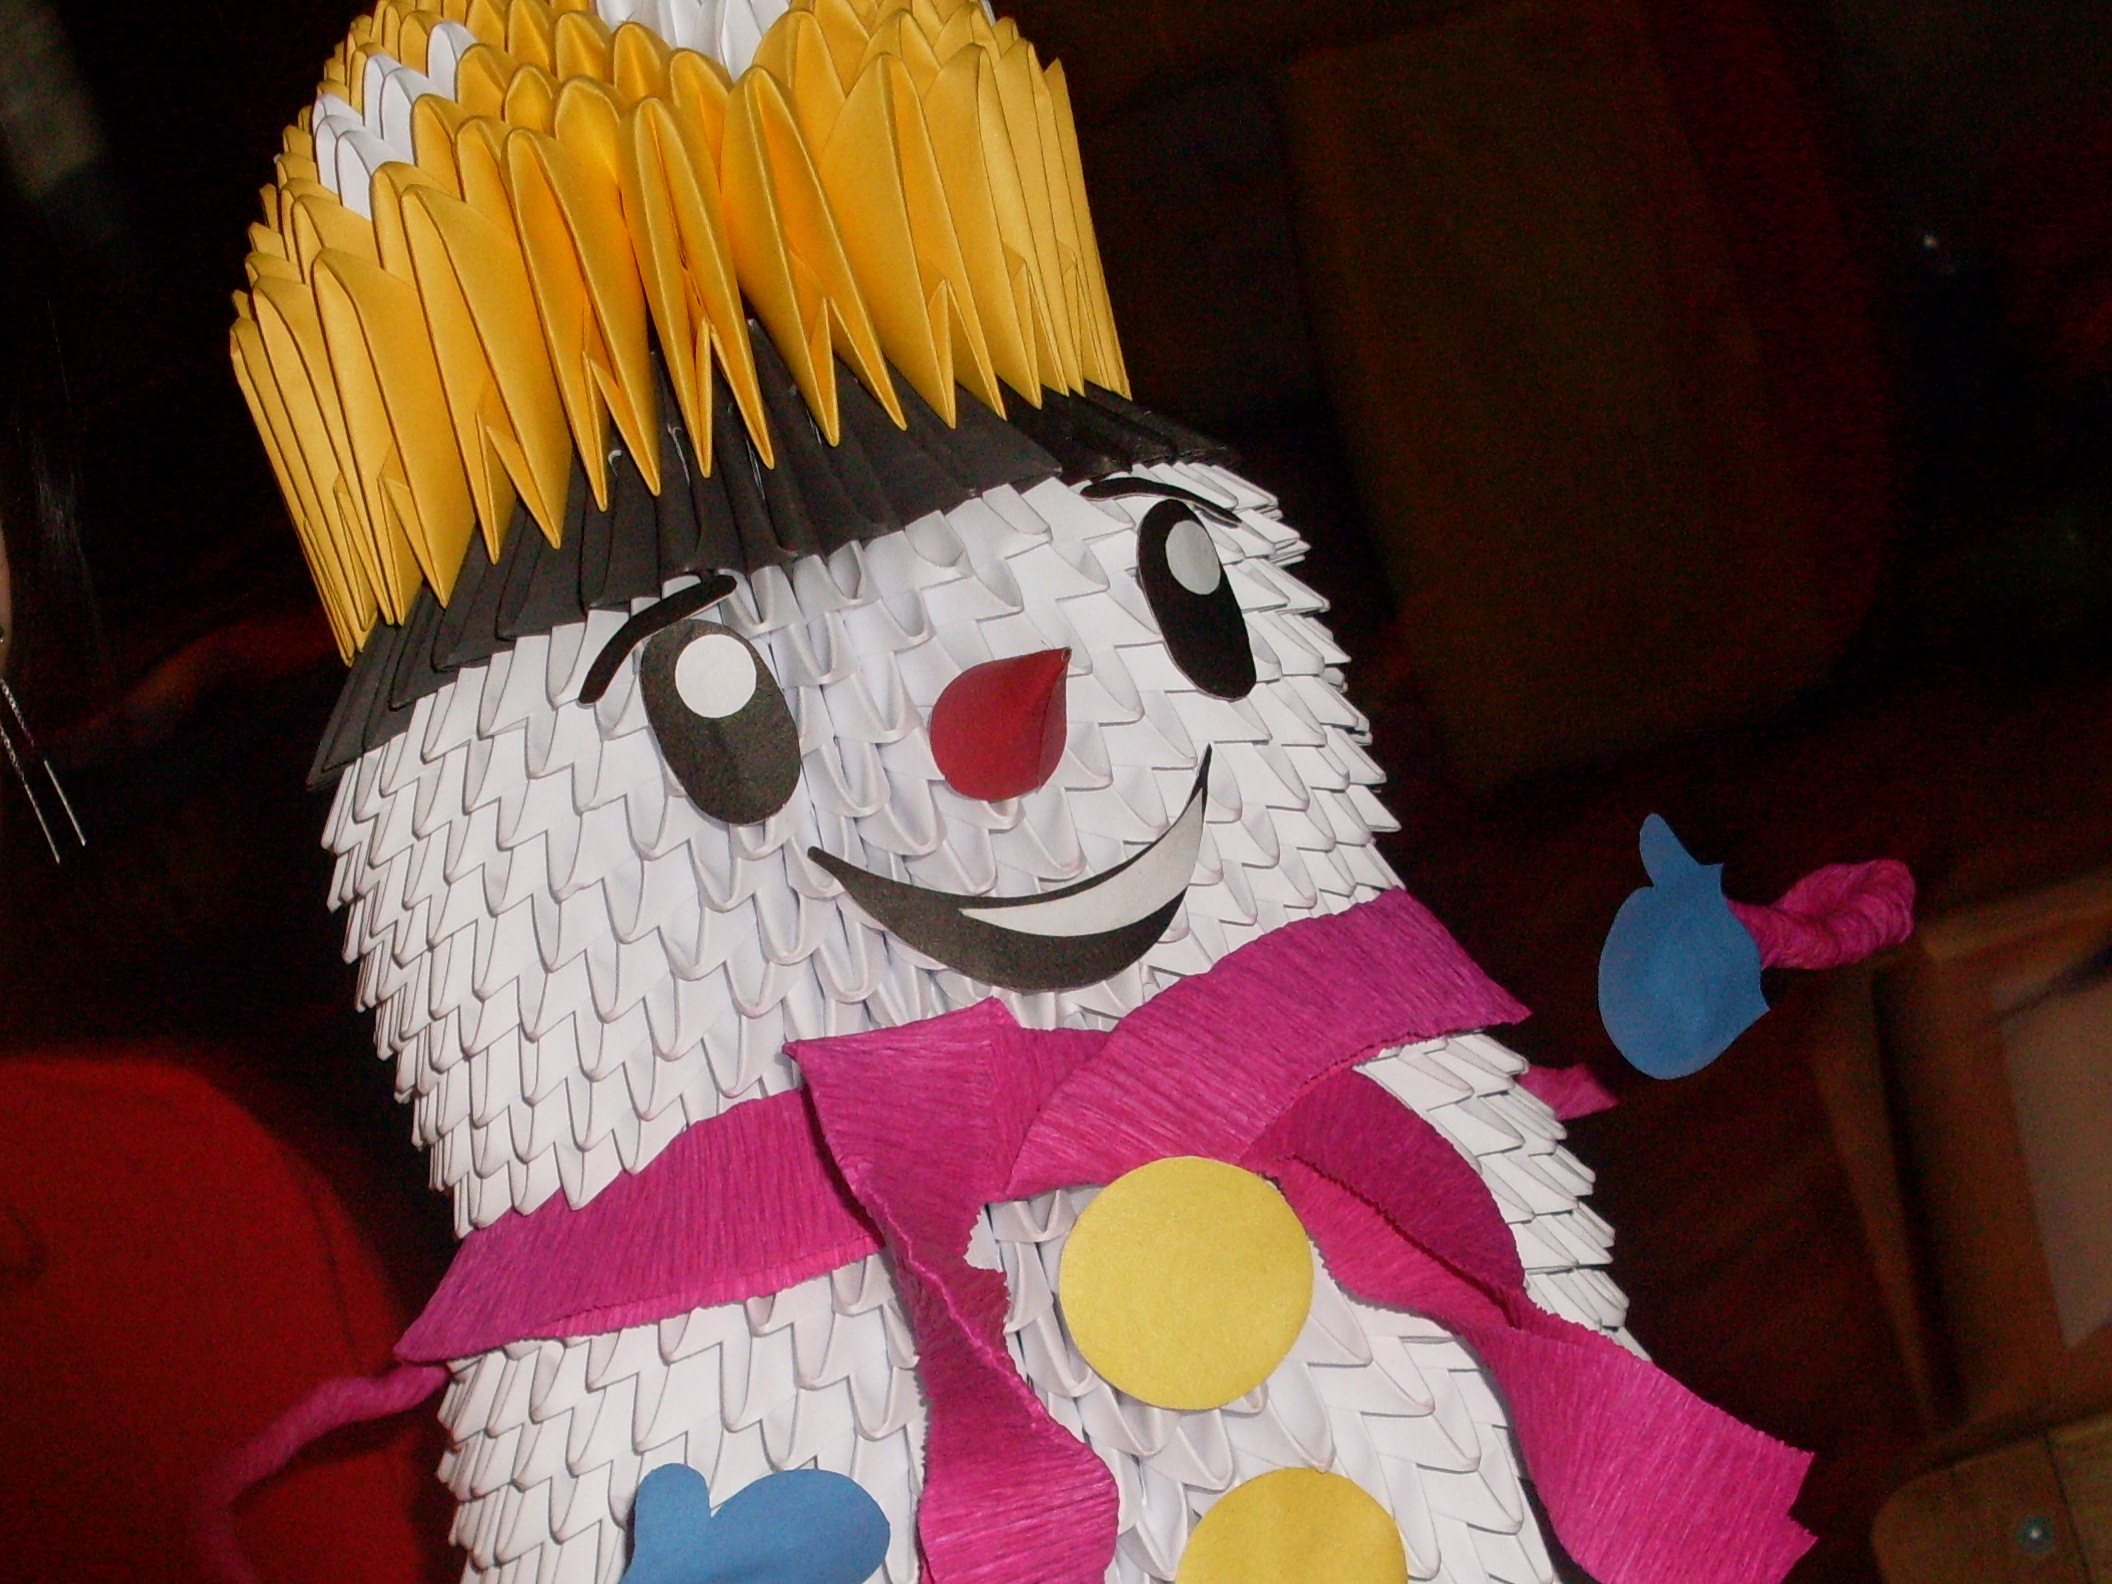 Большой снеговик из бумагиБольшой снеговик из бумаги